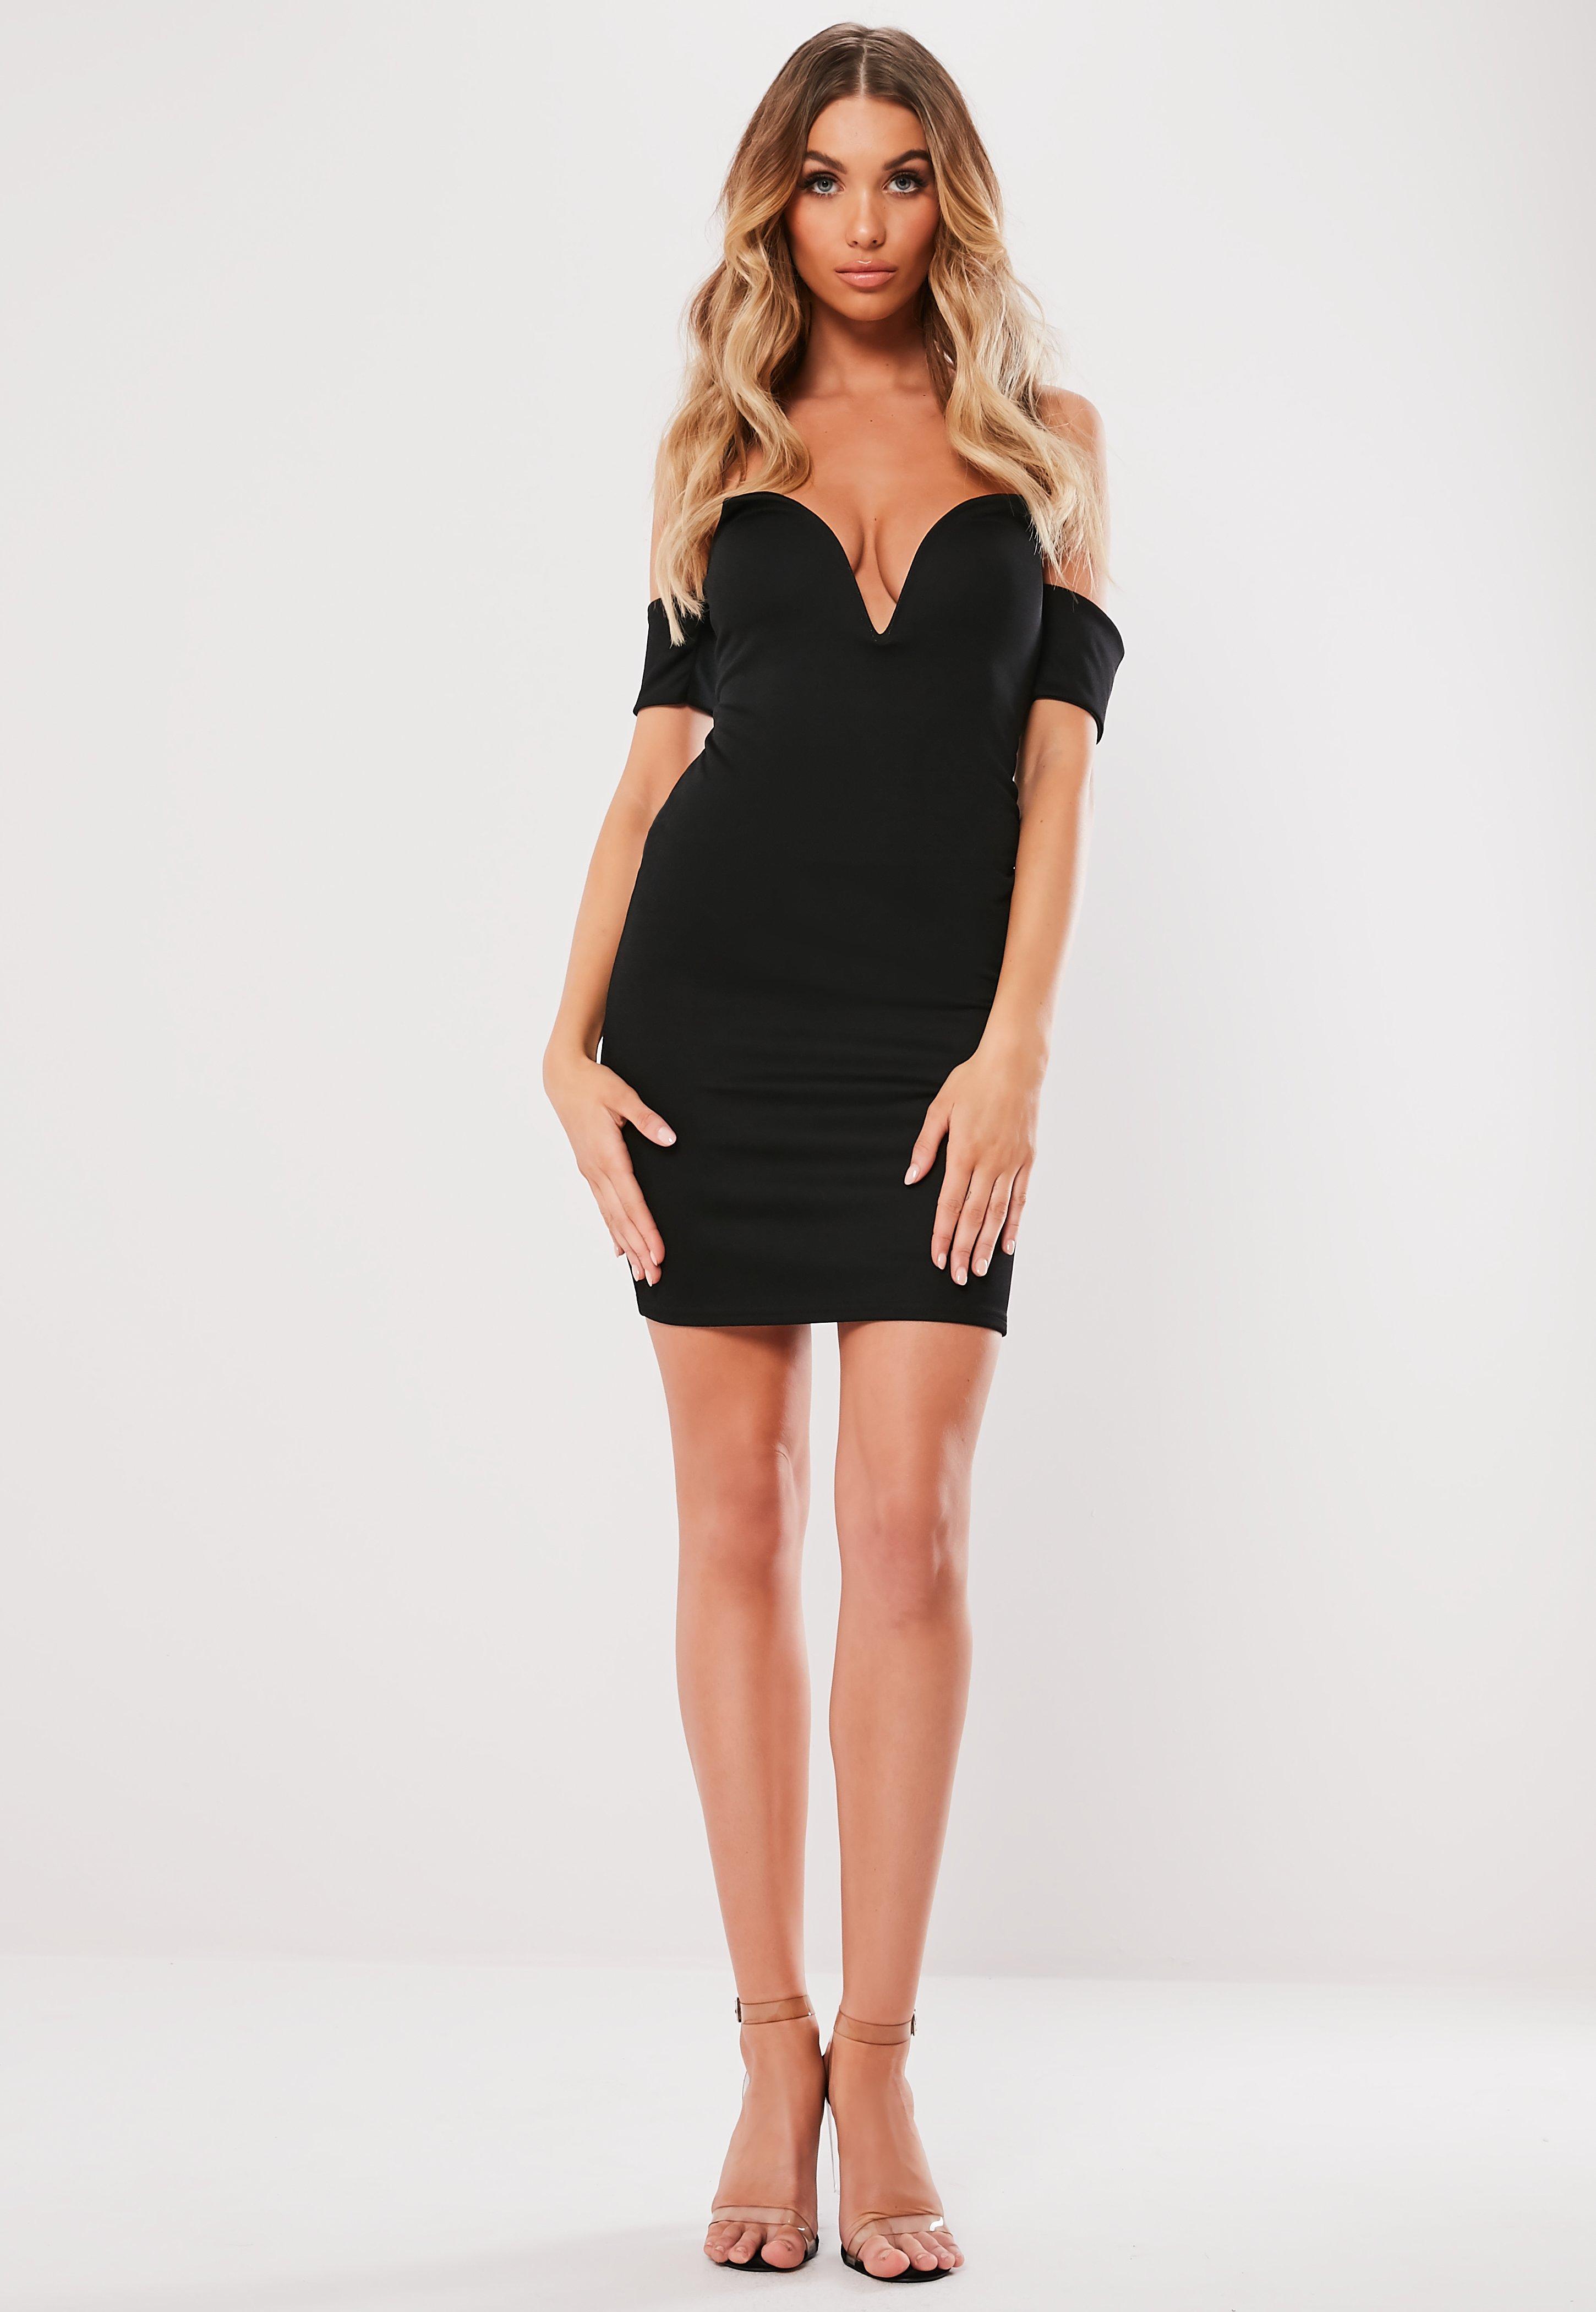 Vestido corto negro para la noche